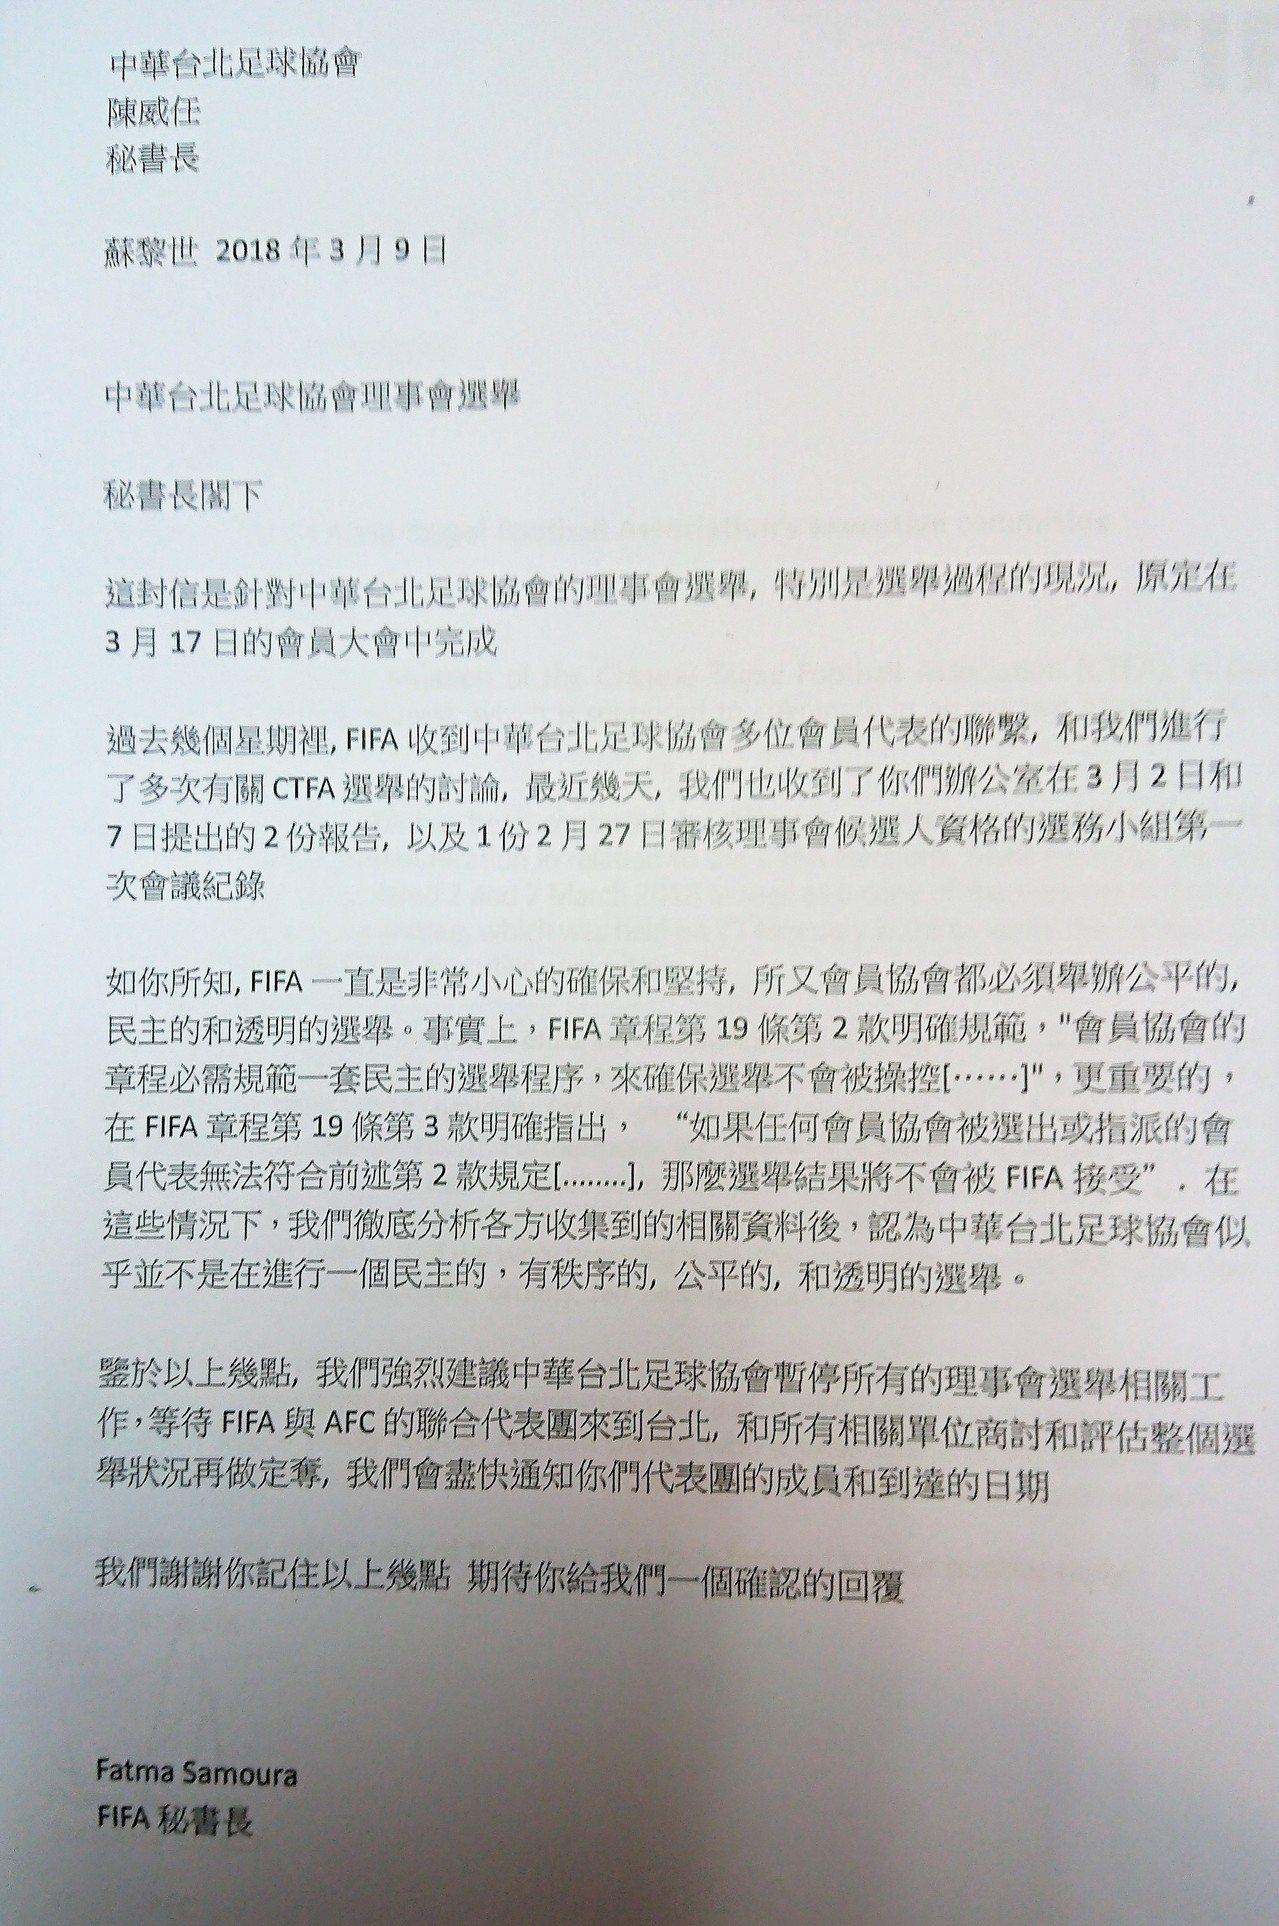 FIFA來函(中文翻譯版)。記者 吳思儀/攝影